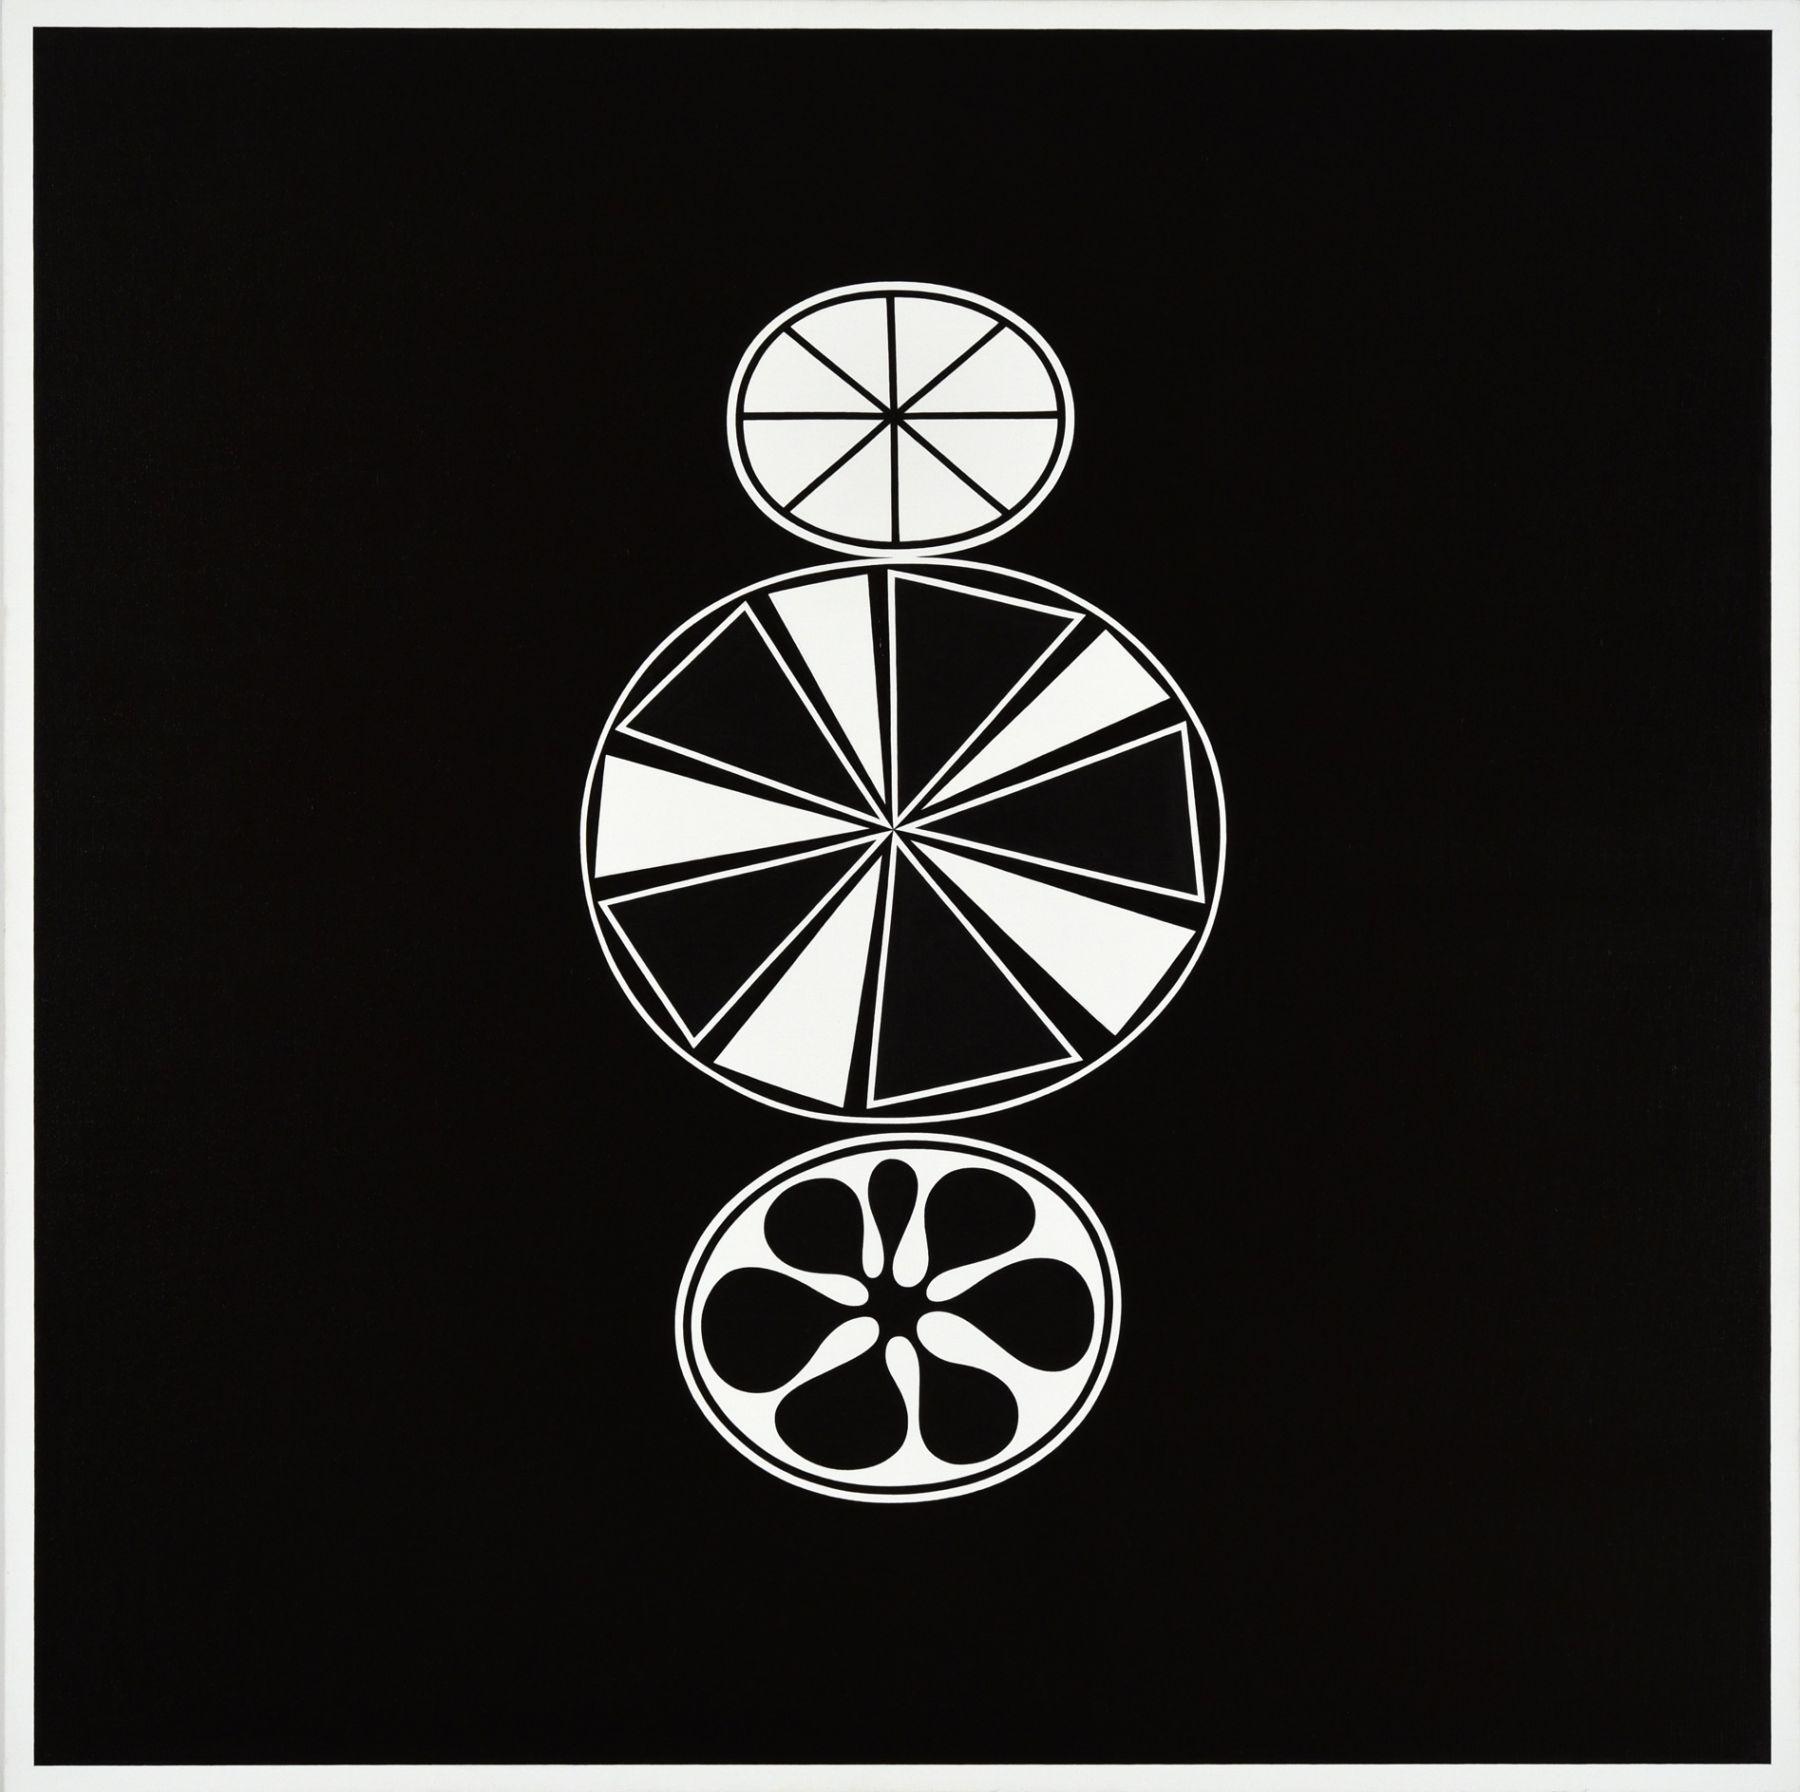 Cary Smith, A Necessary Coexistence (black-white), 2017